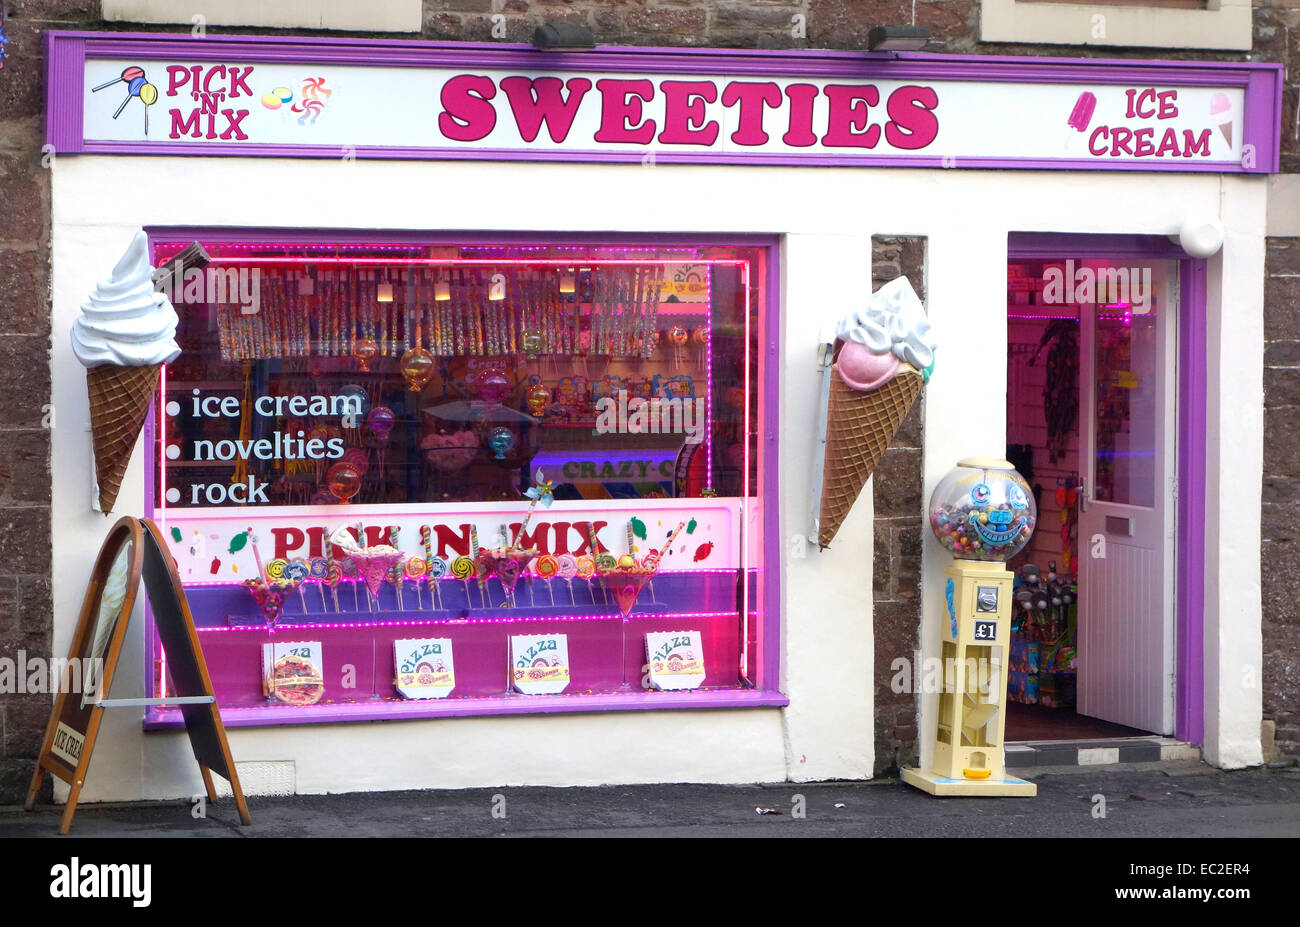 Sweeties Sweet Shop, Leny Road, Callander, Trossachs, Stirlignshire, Scotland, UK - Stock Image